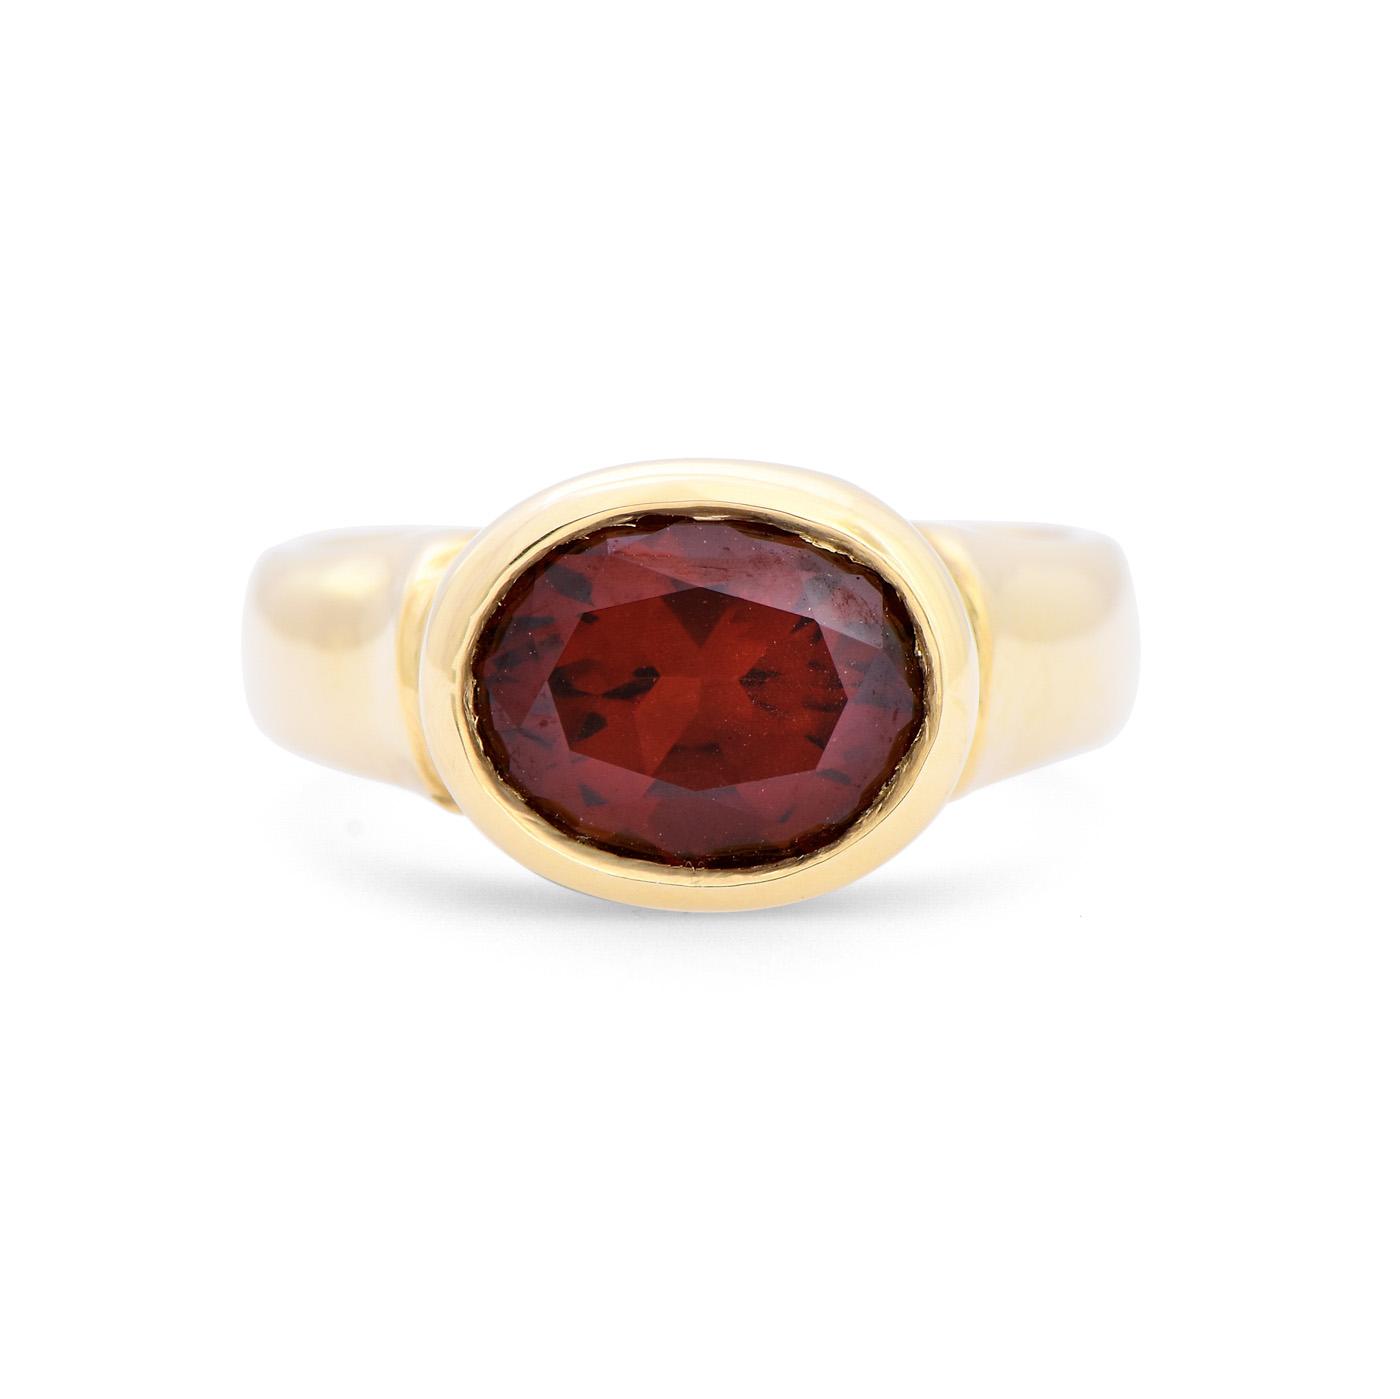 Oval Garnet Bezel Set Ring